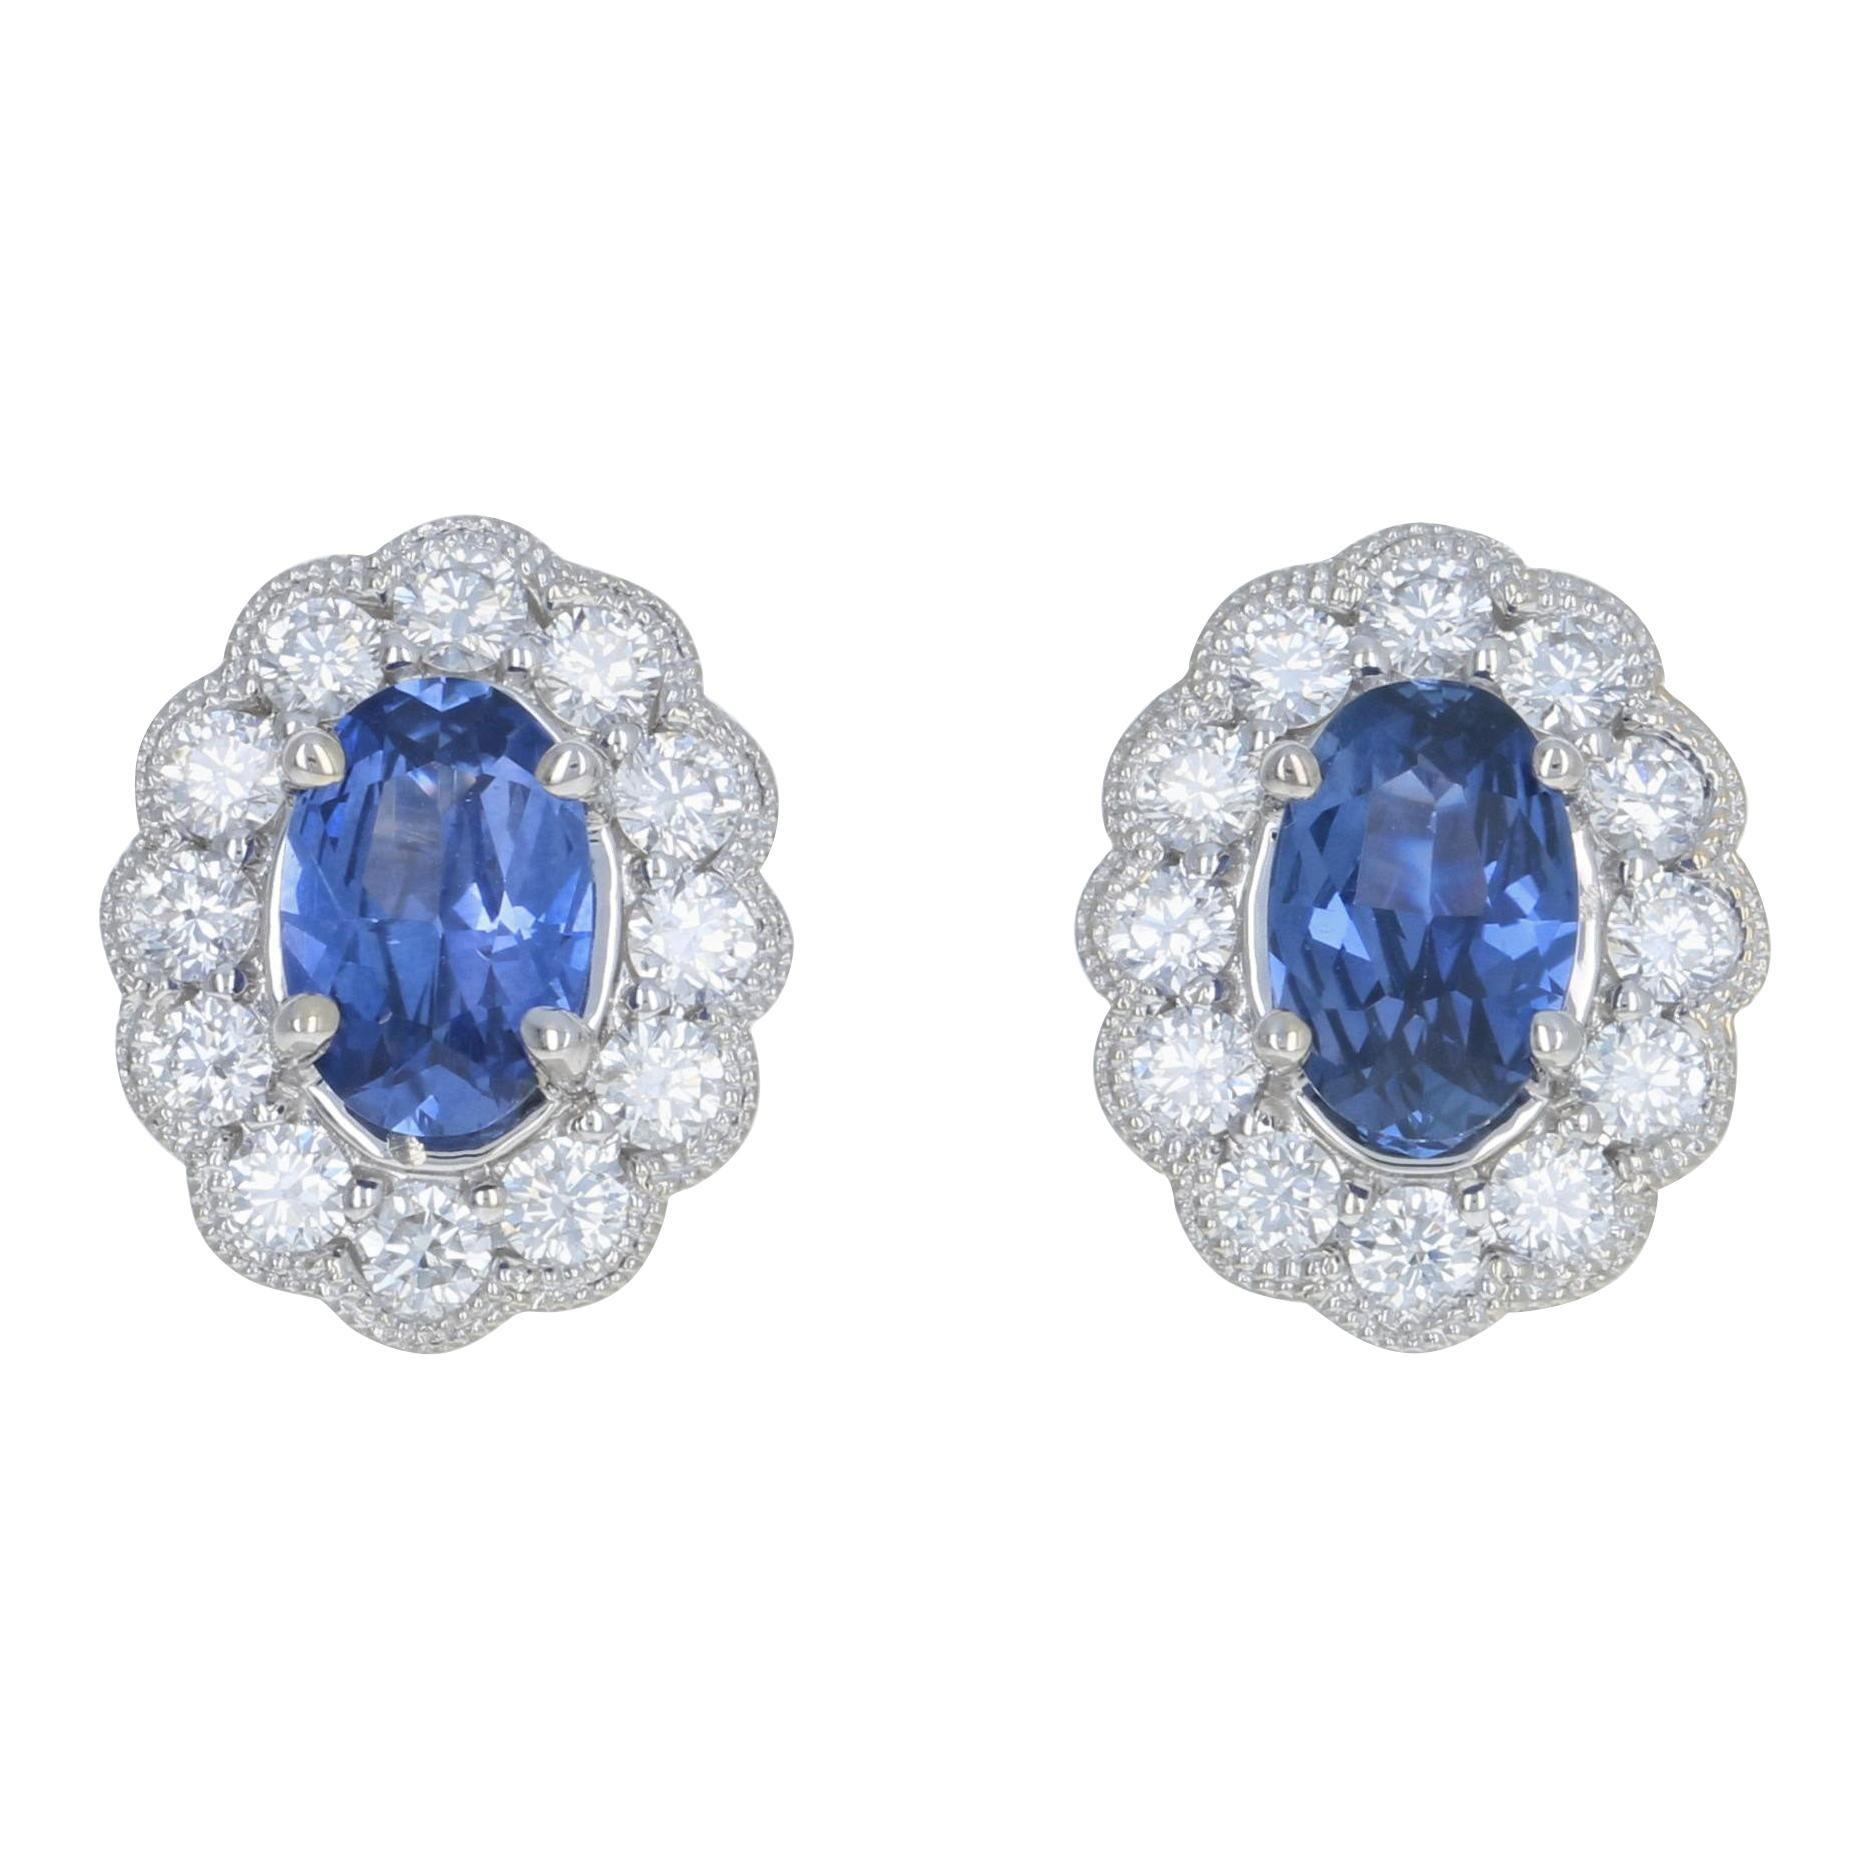 1.54 Carat Oval Cut Sapphire and Diamond Earrings, 14k Gold Pierced Halo Studs